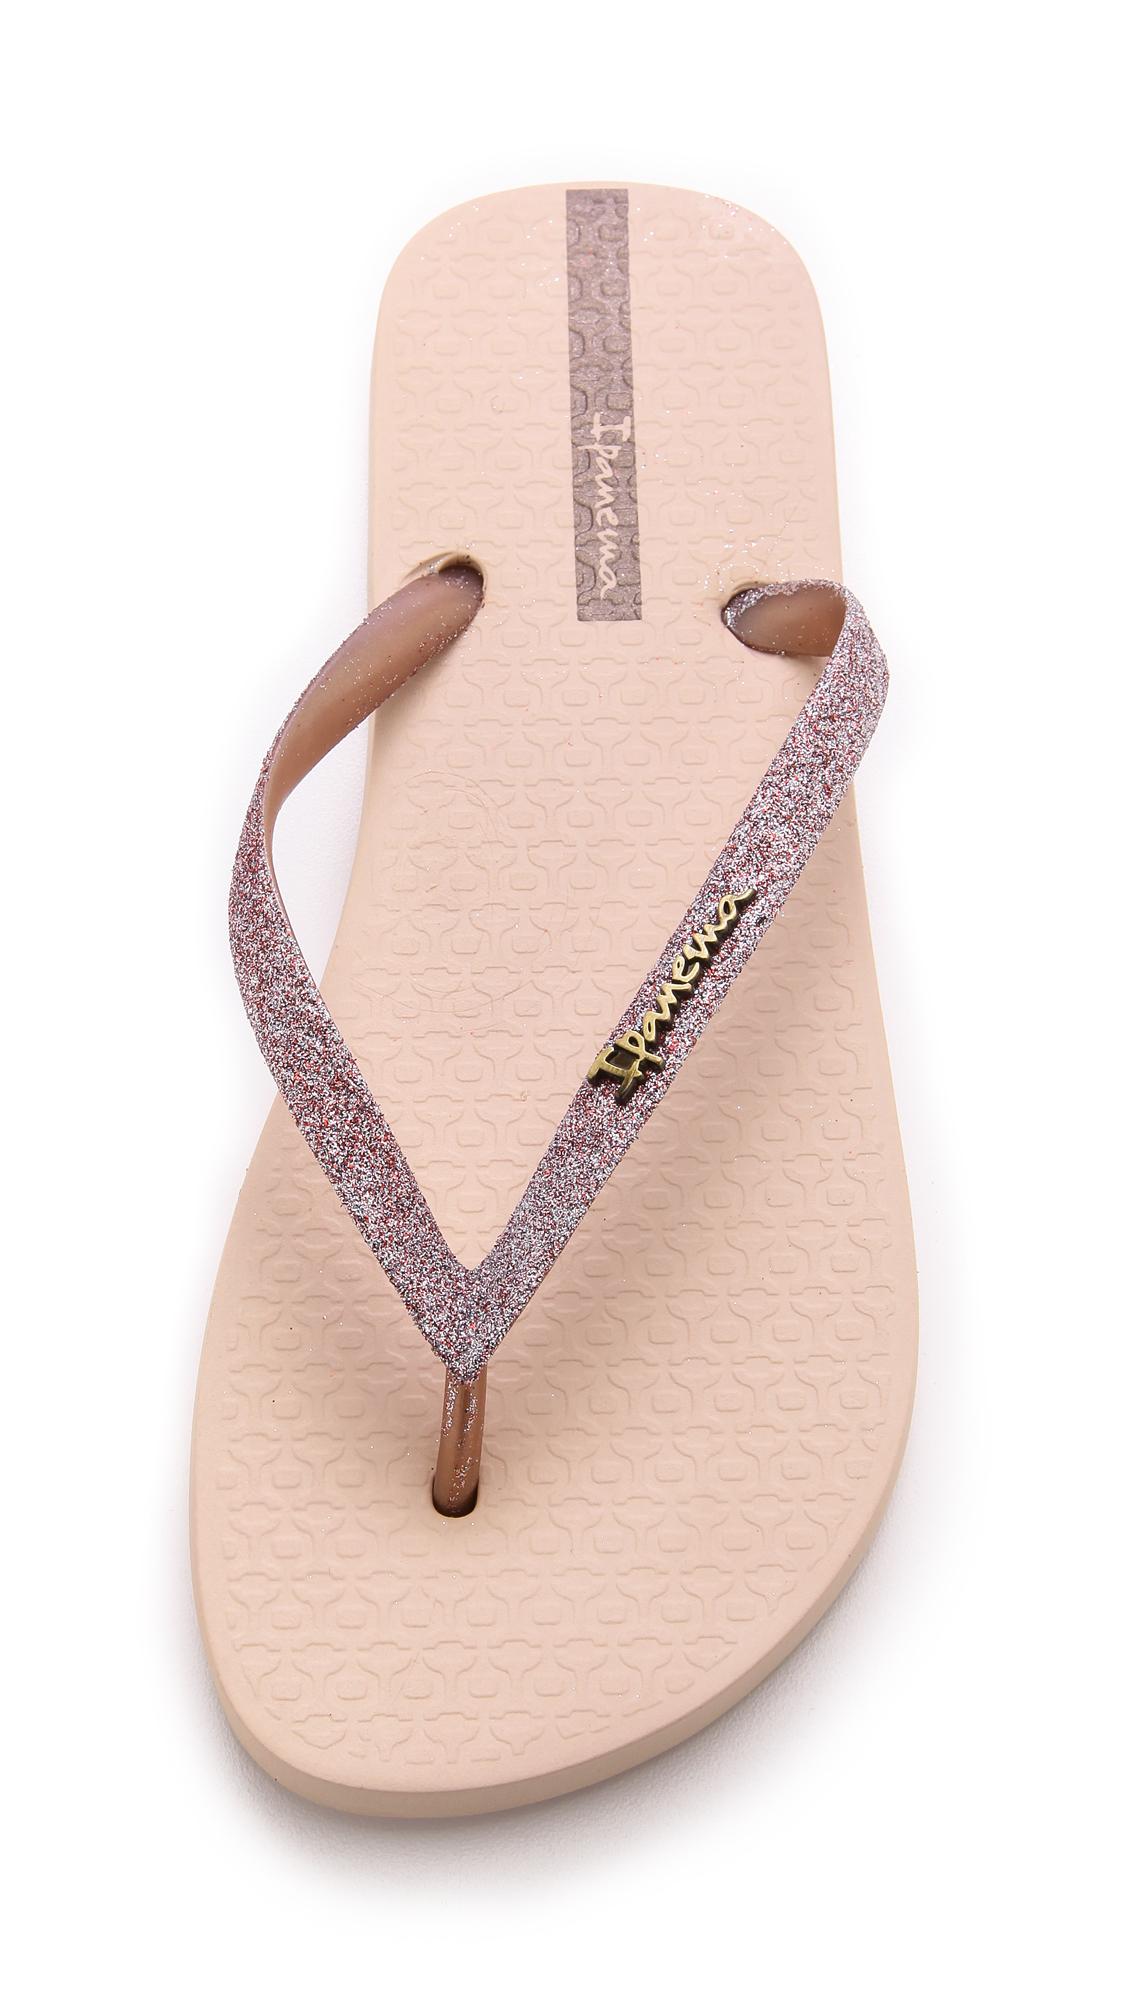 71b83ada22a143 Lyst - Ipanema Glitter Ii Flip Flops - Silver in Pink